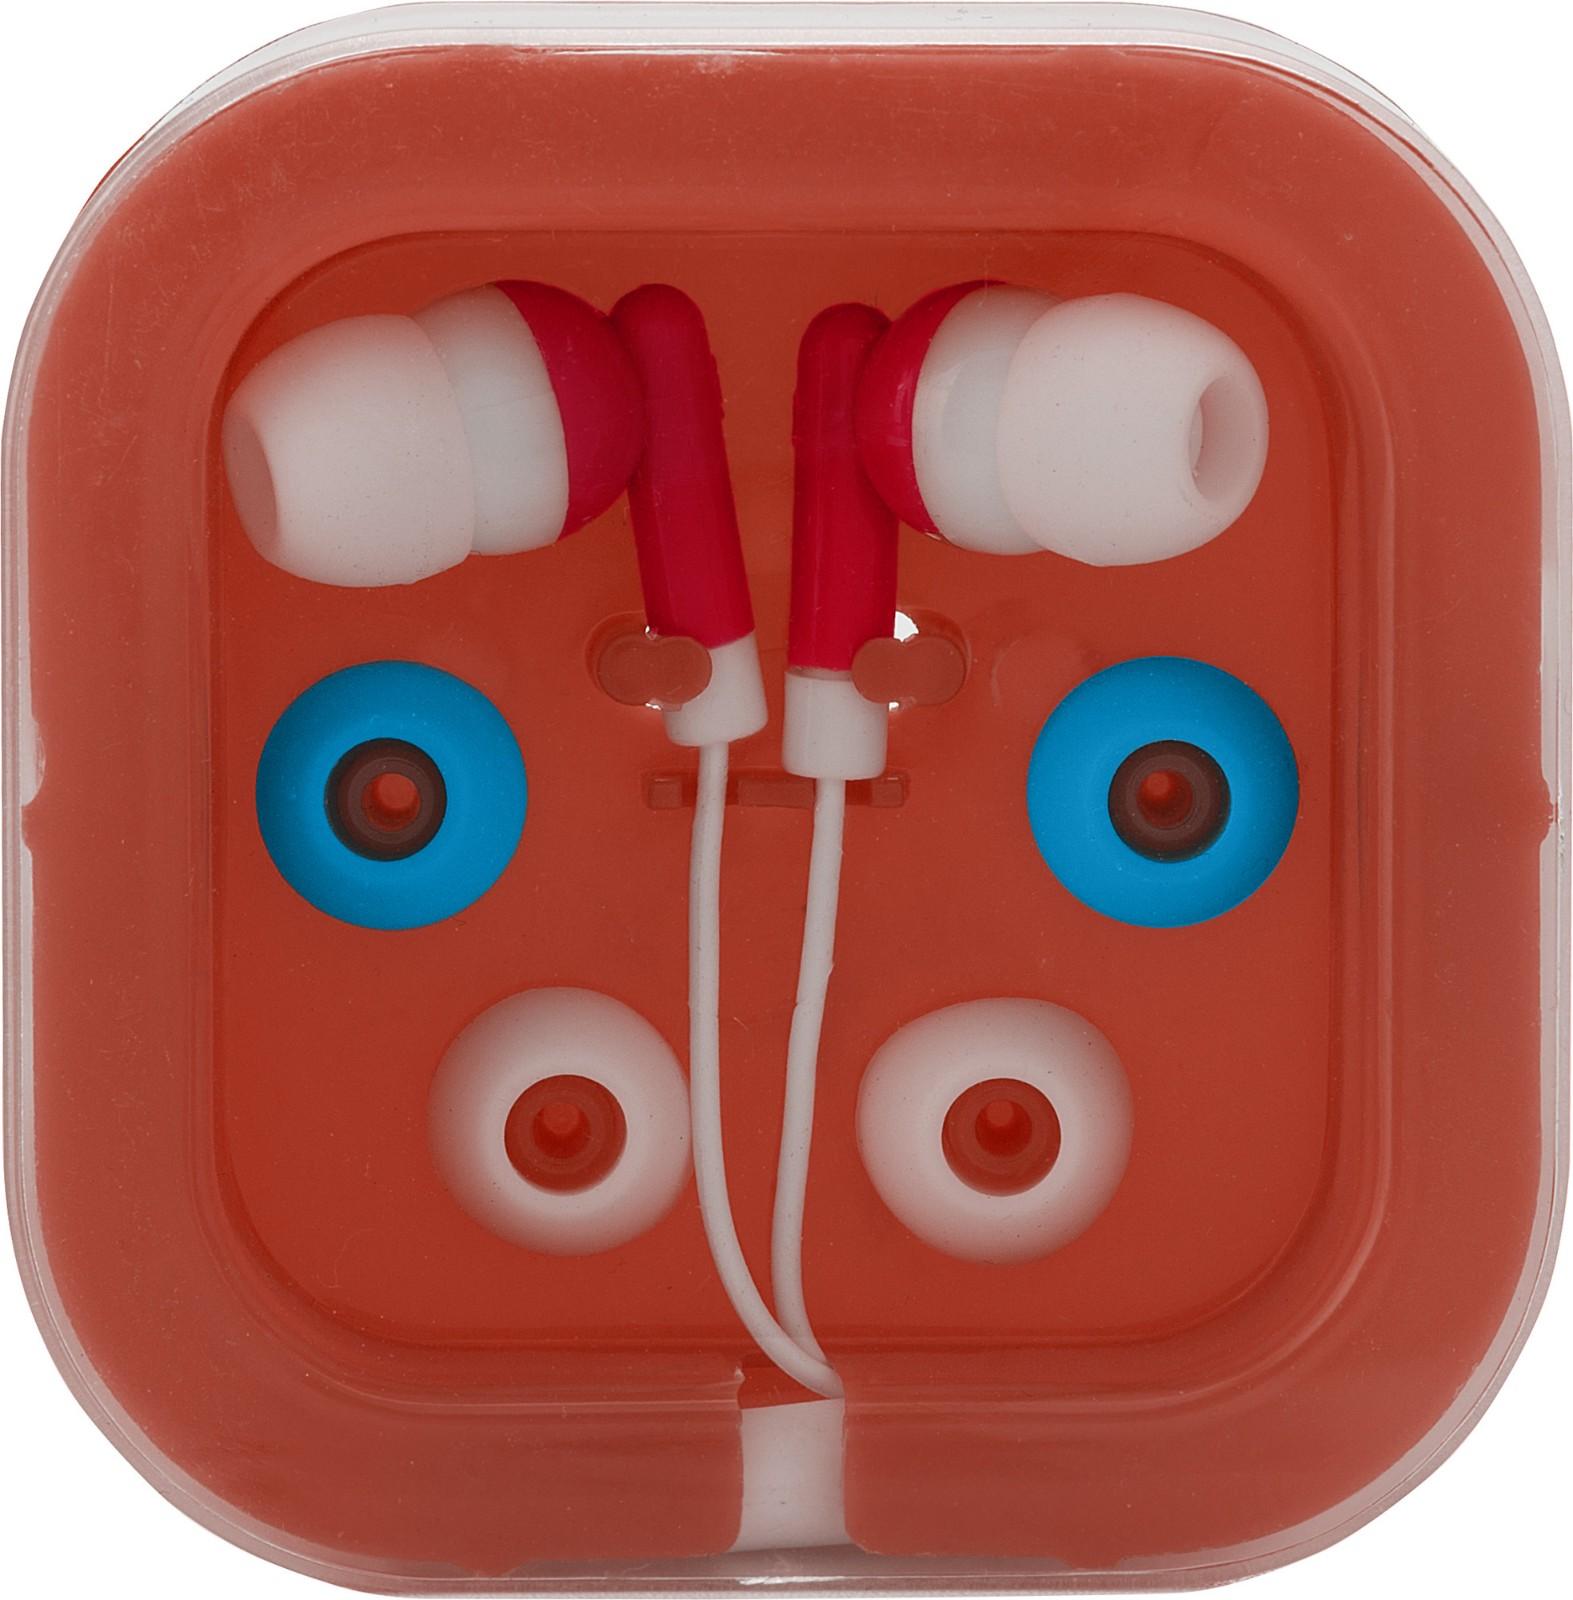 Kopfhörer 'Universal' aus Kunststoff/Metall - Red